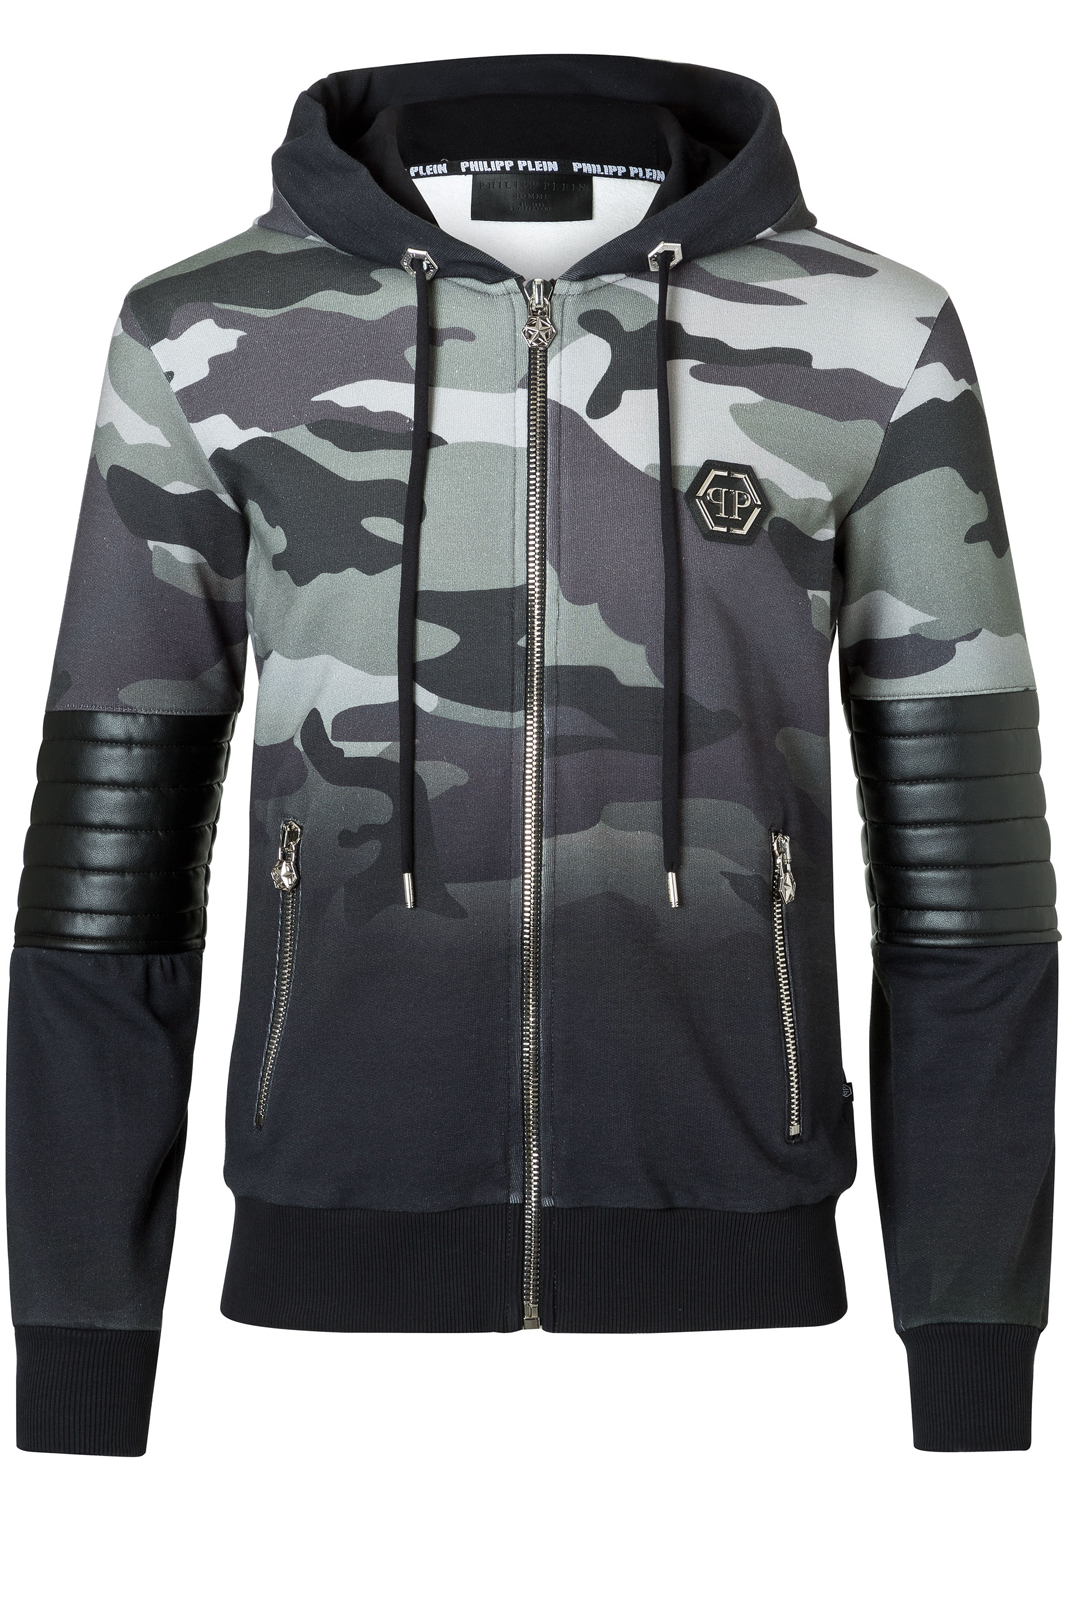 Vestes zippées  Philipp plein MJB0110 RAIDEN CM99 CAMOU BLACK